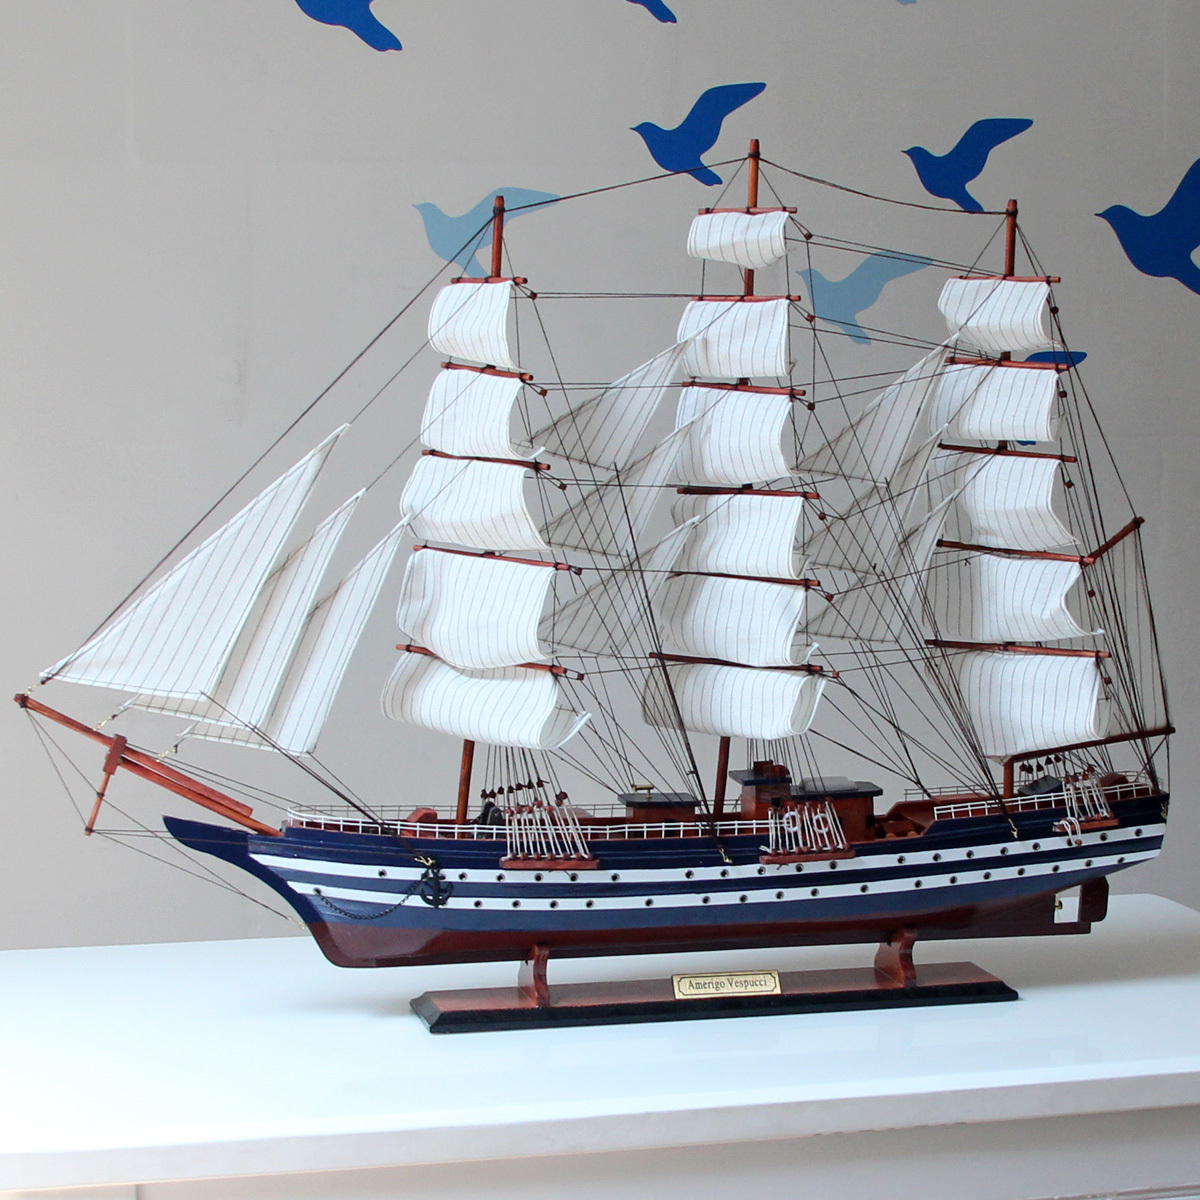 Декоративный корабль Mettle mt002/100 100cm zipower pm 5139